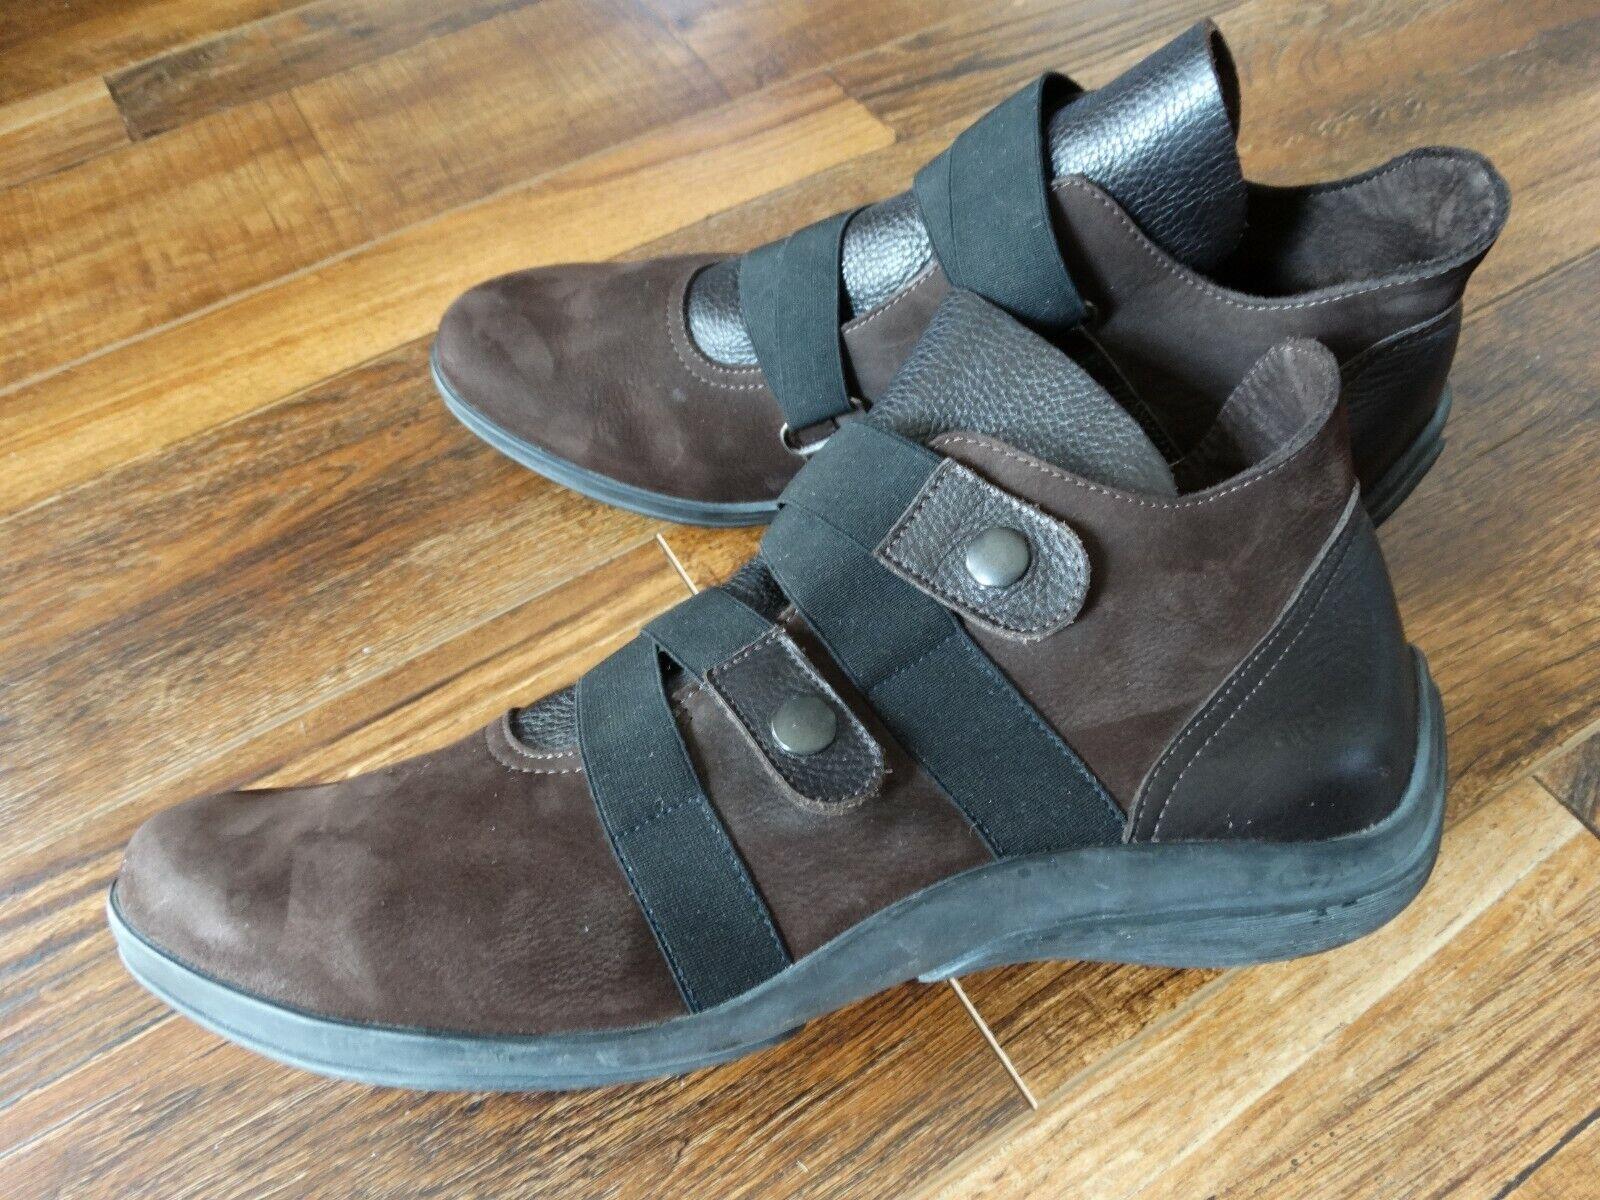 ARCHE LN France slip on Ankle shoes 9.5